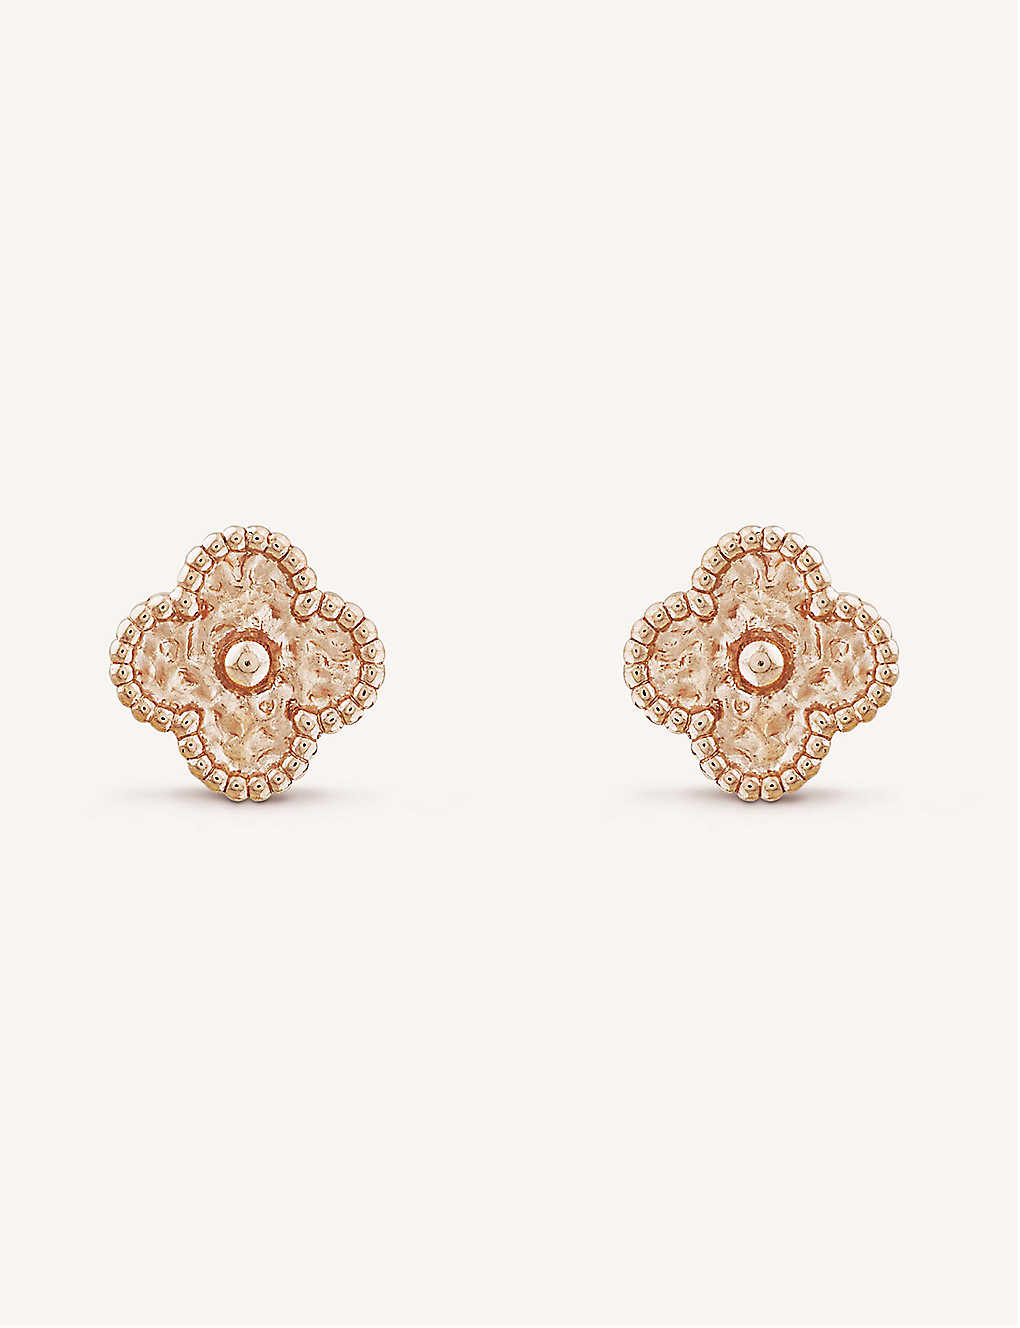 af6e6ff73 VAN CLEEF & ARPELS - Sweet Alhambra gold stud earrings | Selfridges.com